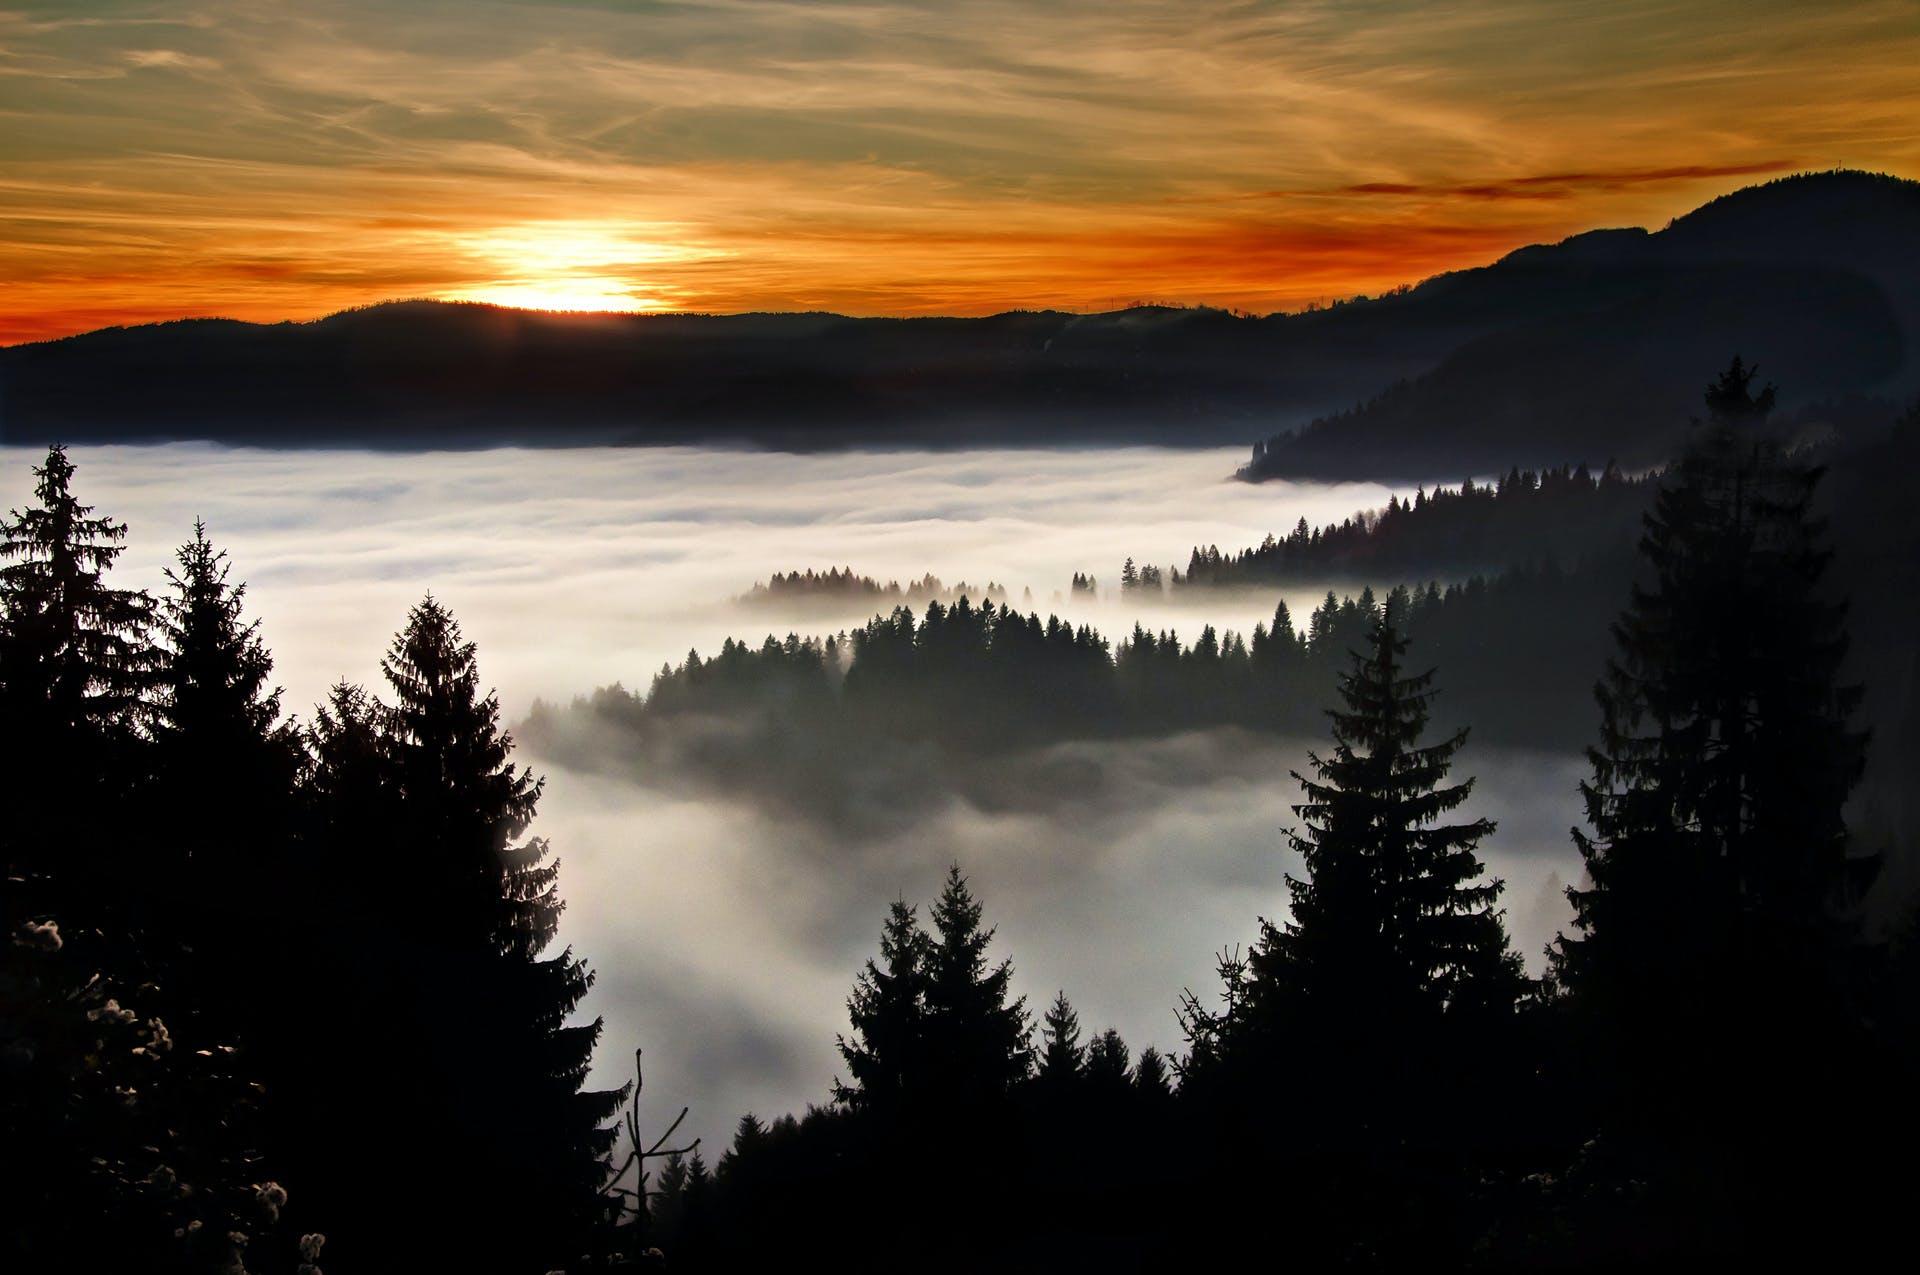 Kostenloses Stock Foto zu abend, bäume, berge, bergspitze